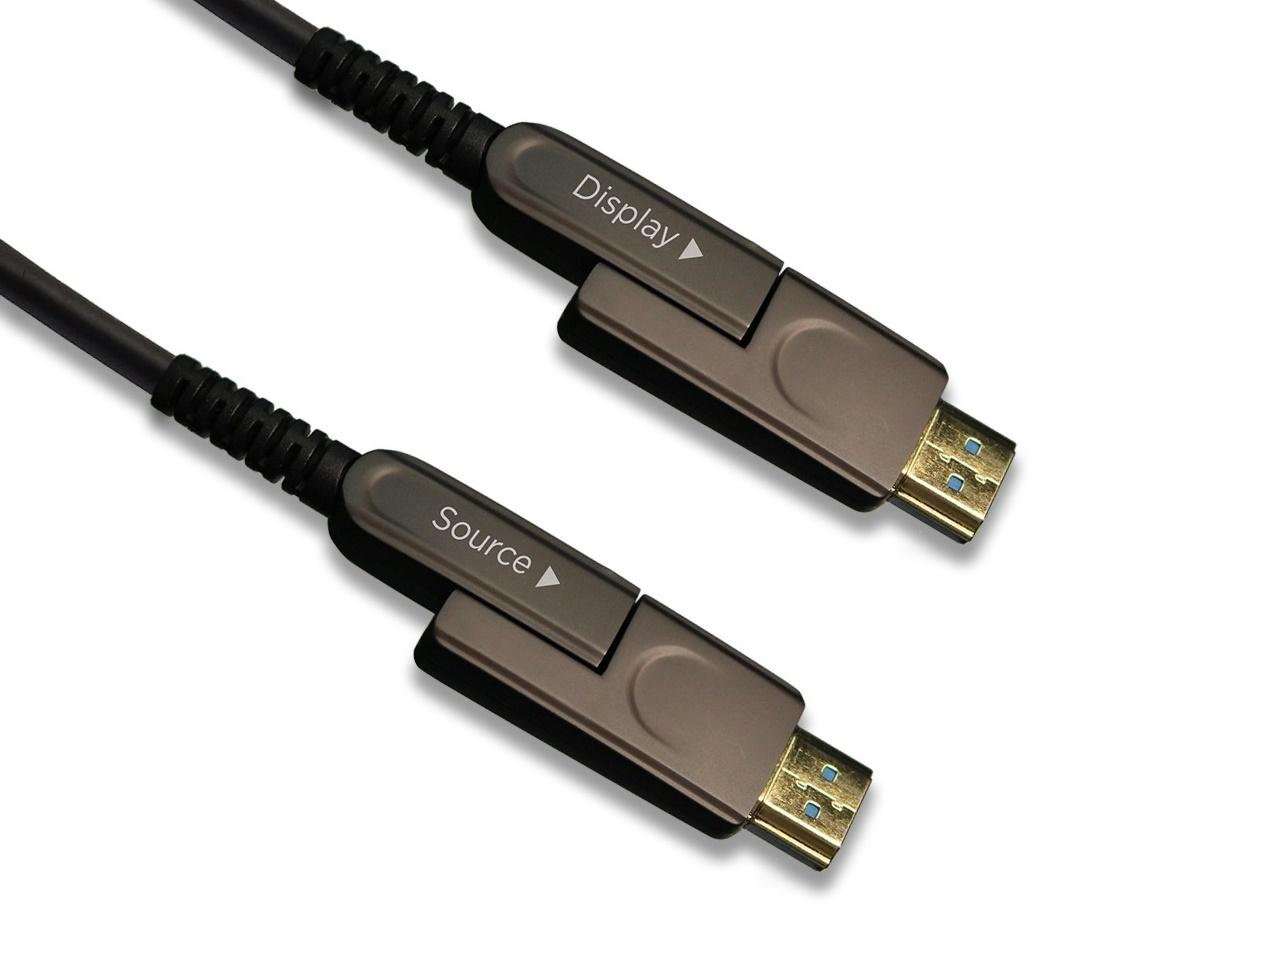 PureLink EZH2-DT-050 50m/165ft EZ Detachable HDMI 2.0 over Fiber Cable with TotalWire Technology